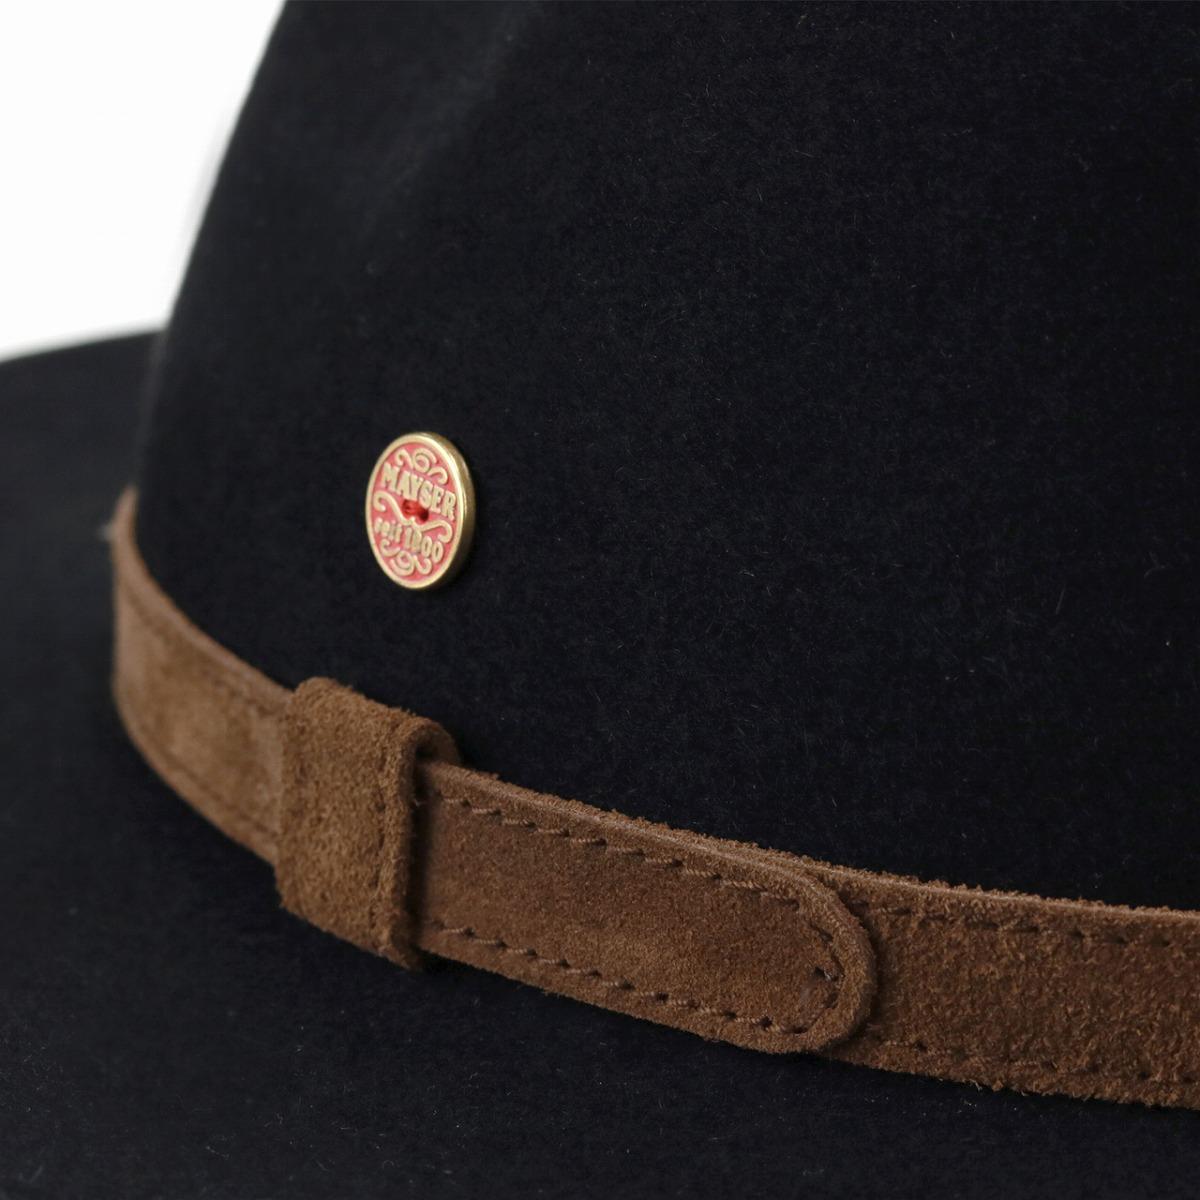 52e89f8465 Y ditch rim suede genuine leather hat soft felt hat hat men Mai Zara bit  fur felt hat Lady's felt hat men MAYSER trilby hat Shin pull gentleman / ...